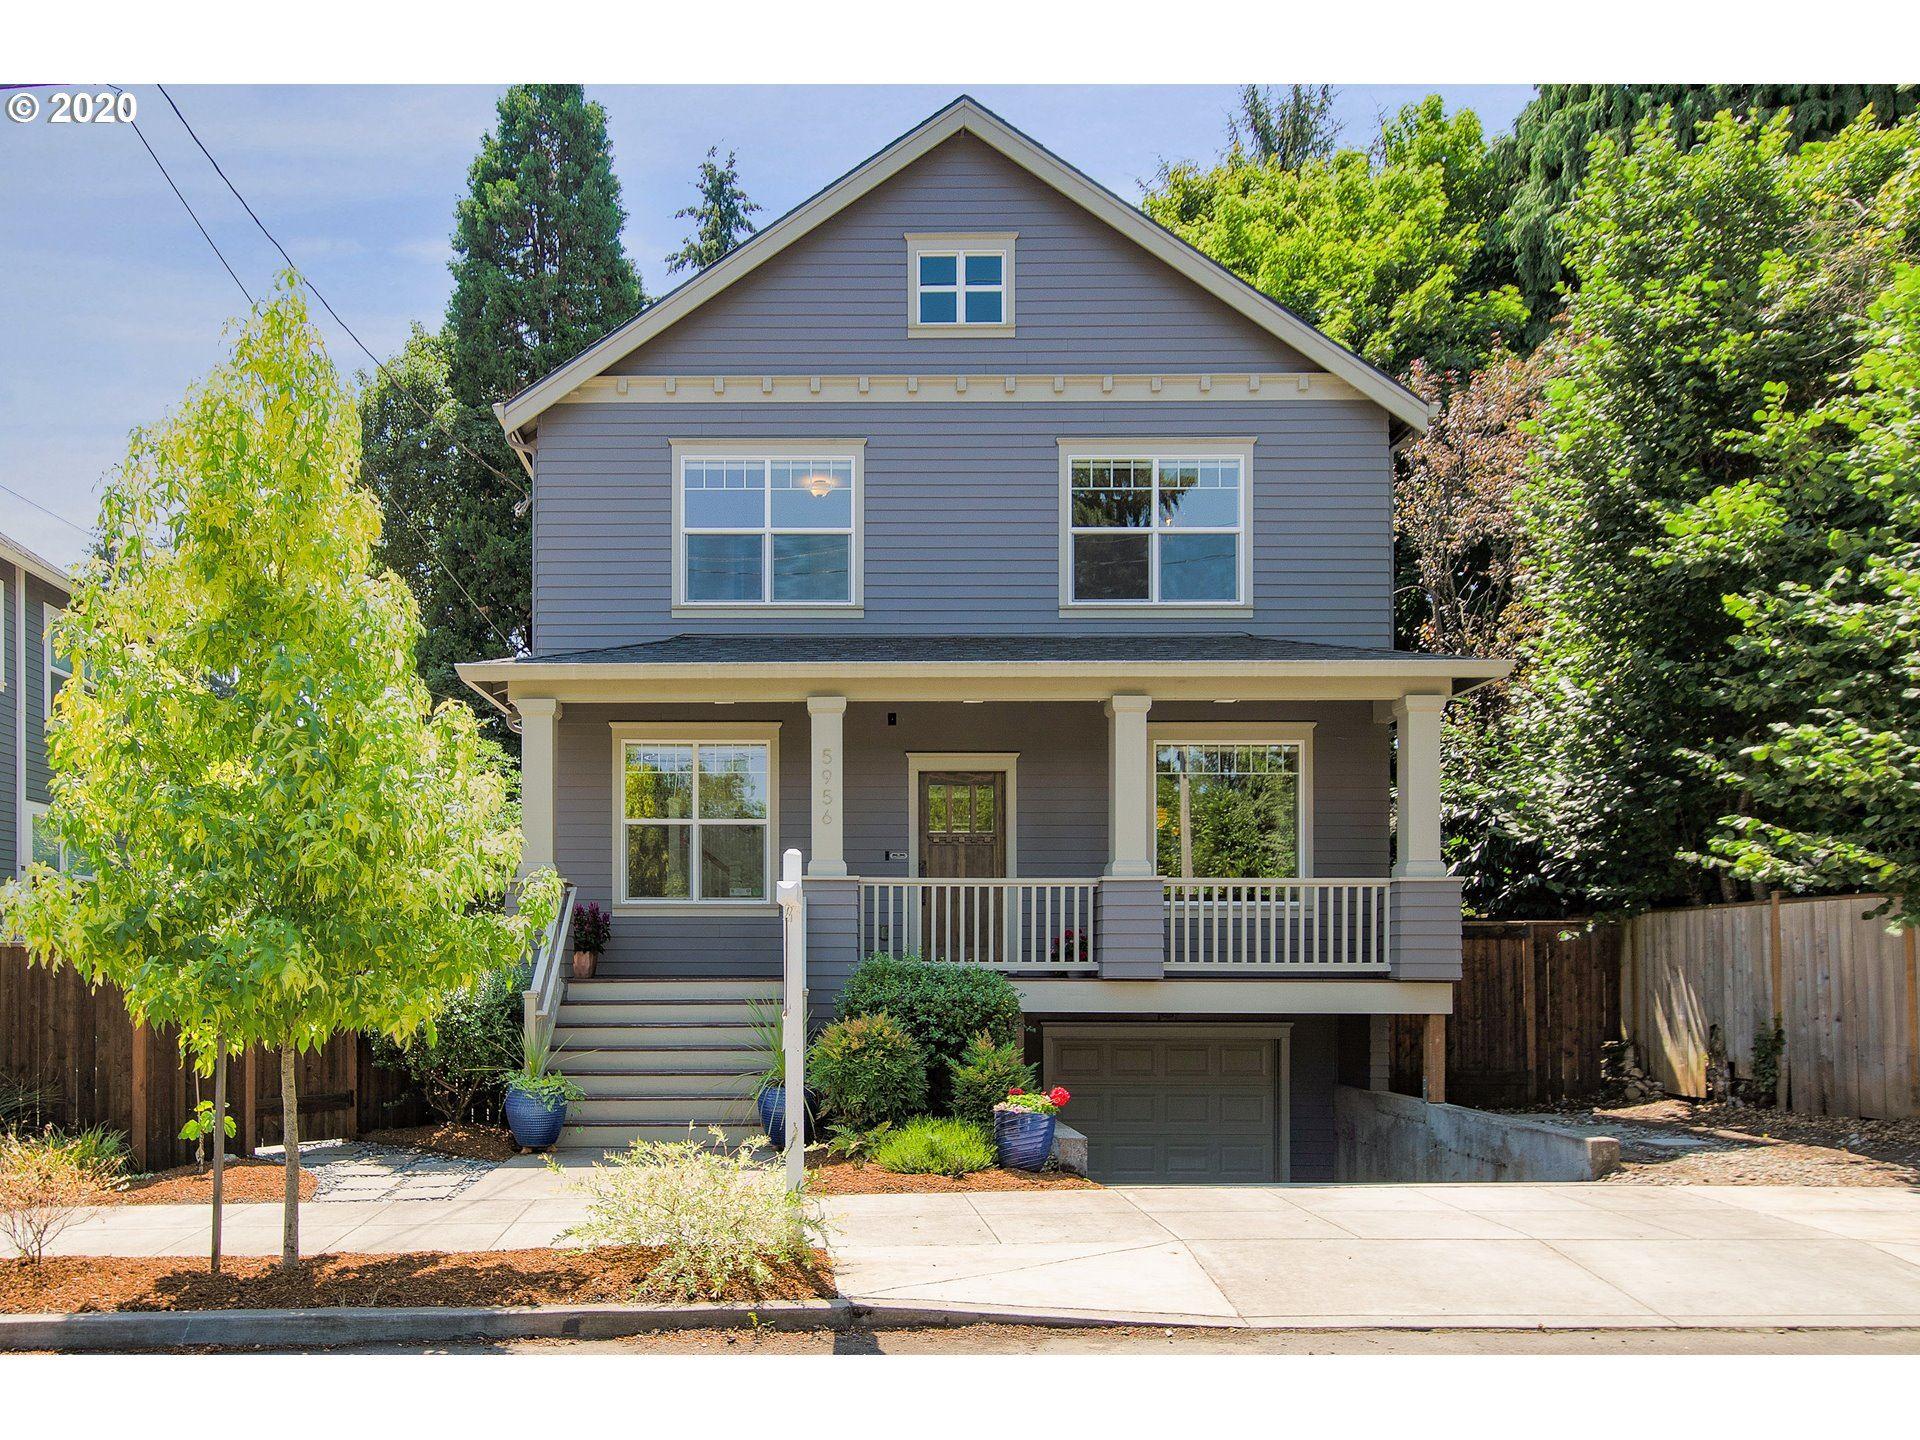 5956 NE TILLAMOOK ST, Portland, OR 97213 - MLS#: 20463797